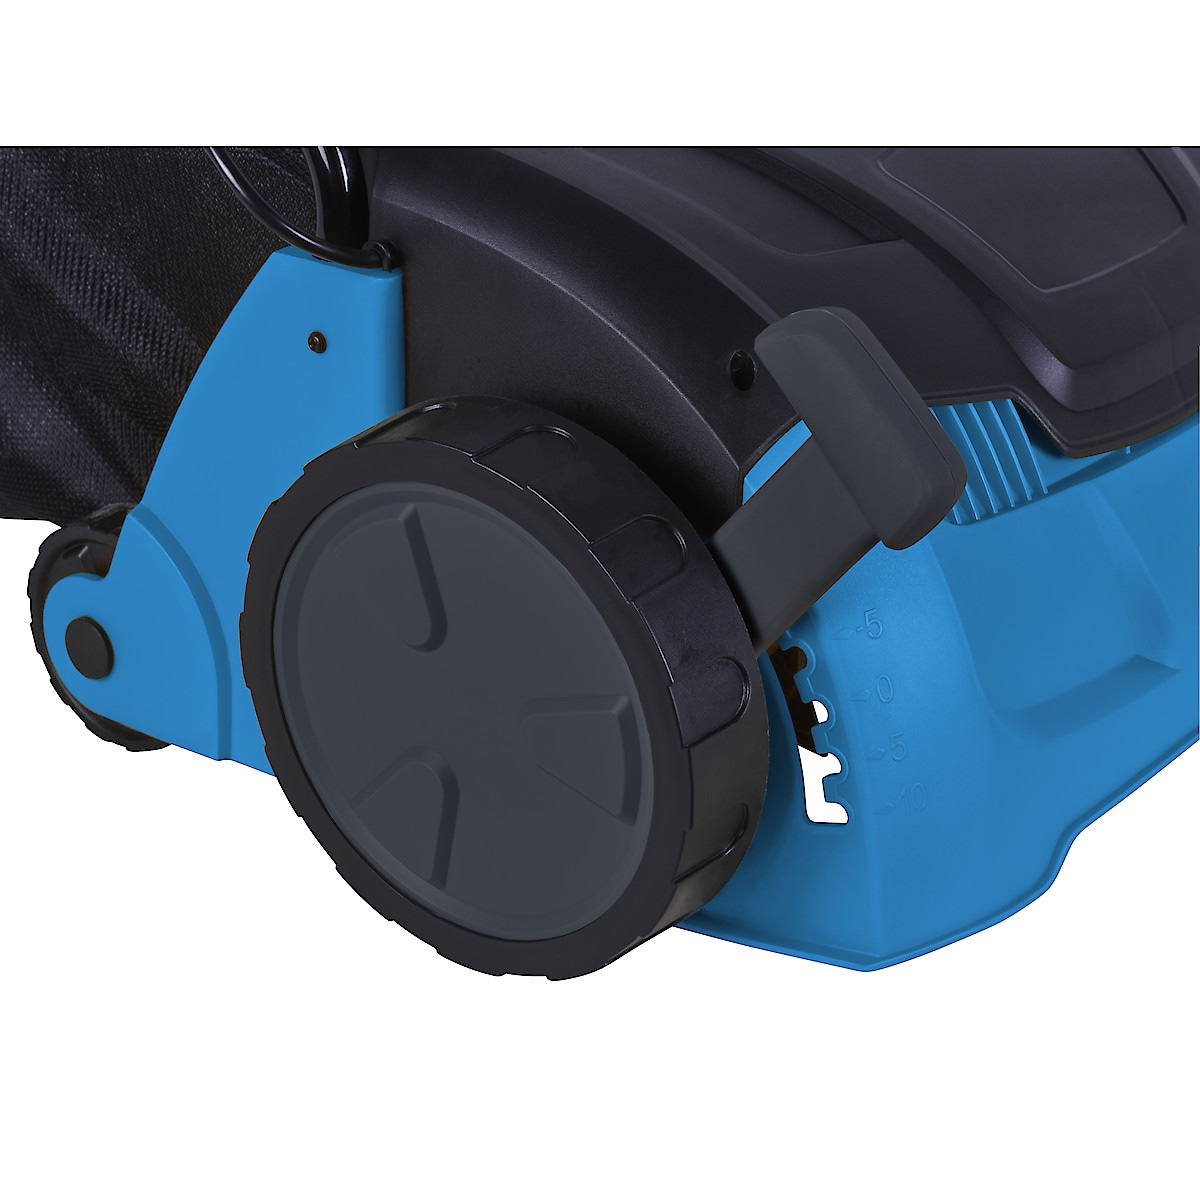 Cocraft HSR 1300 Lawn Scarifier